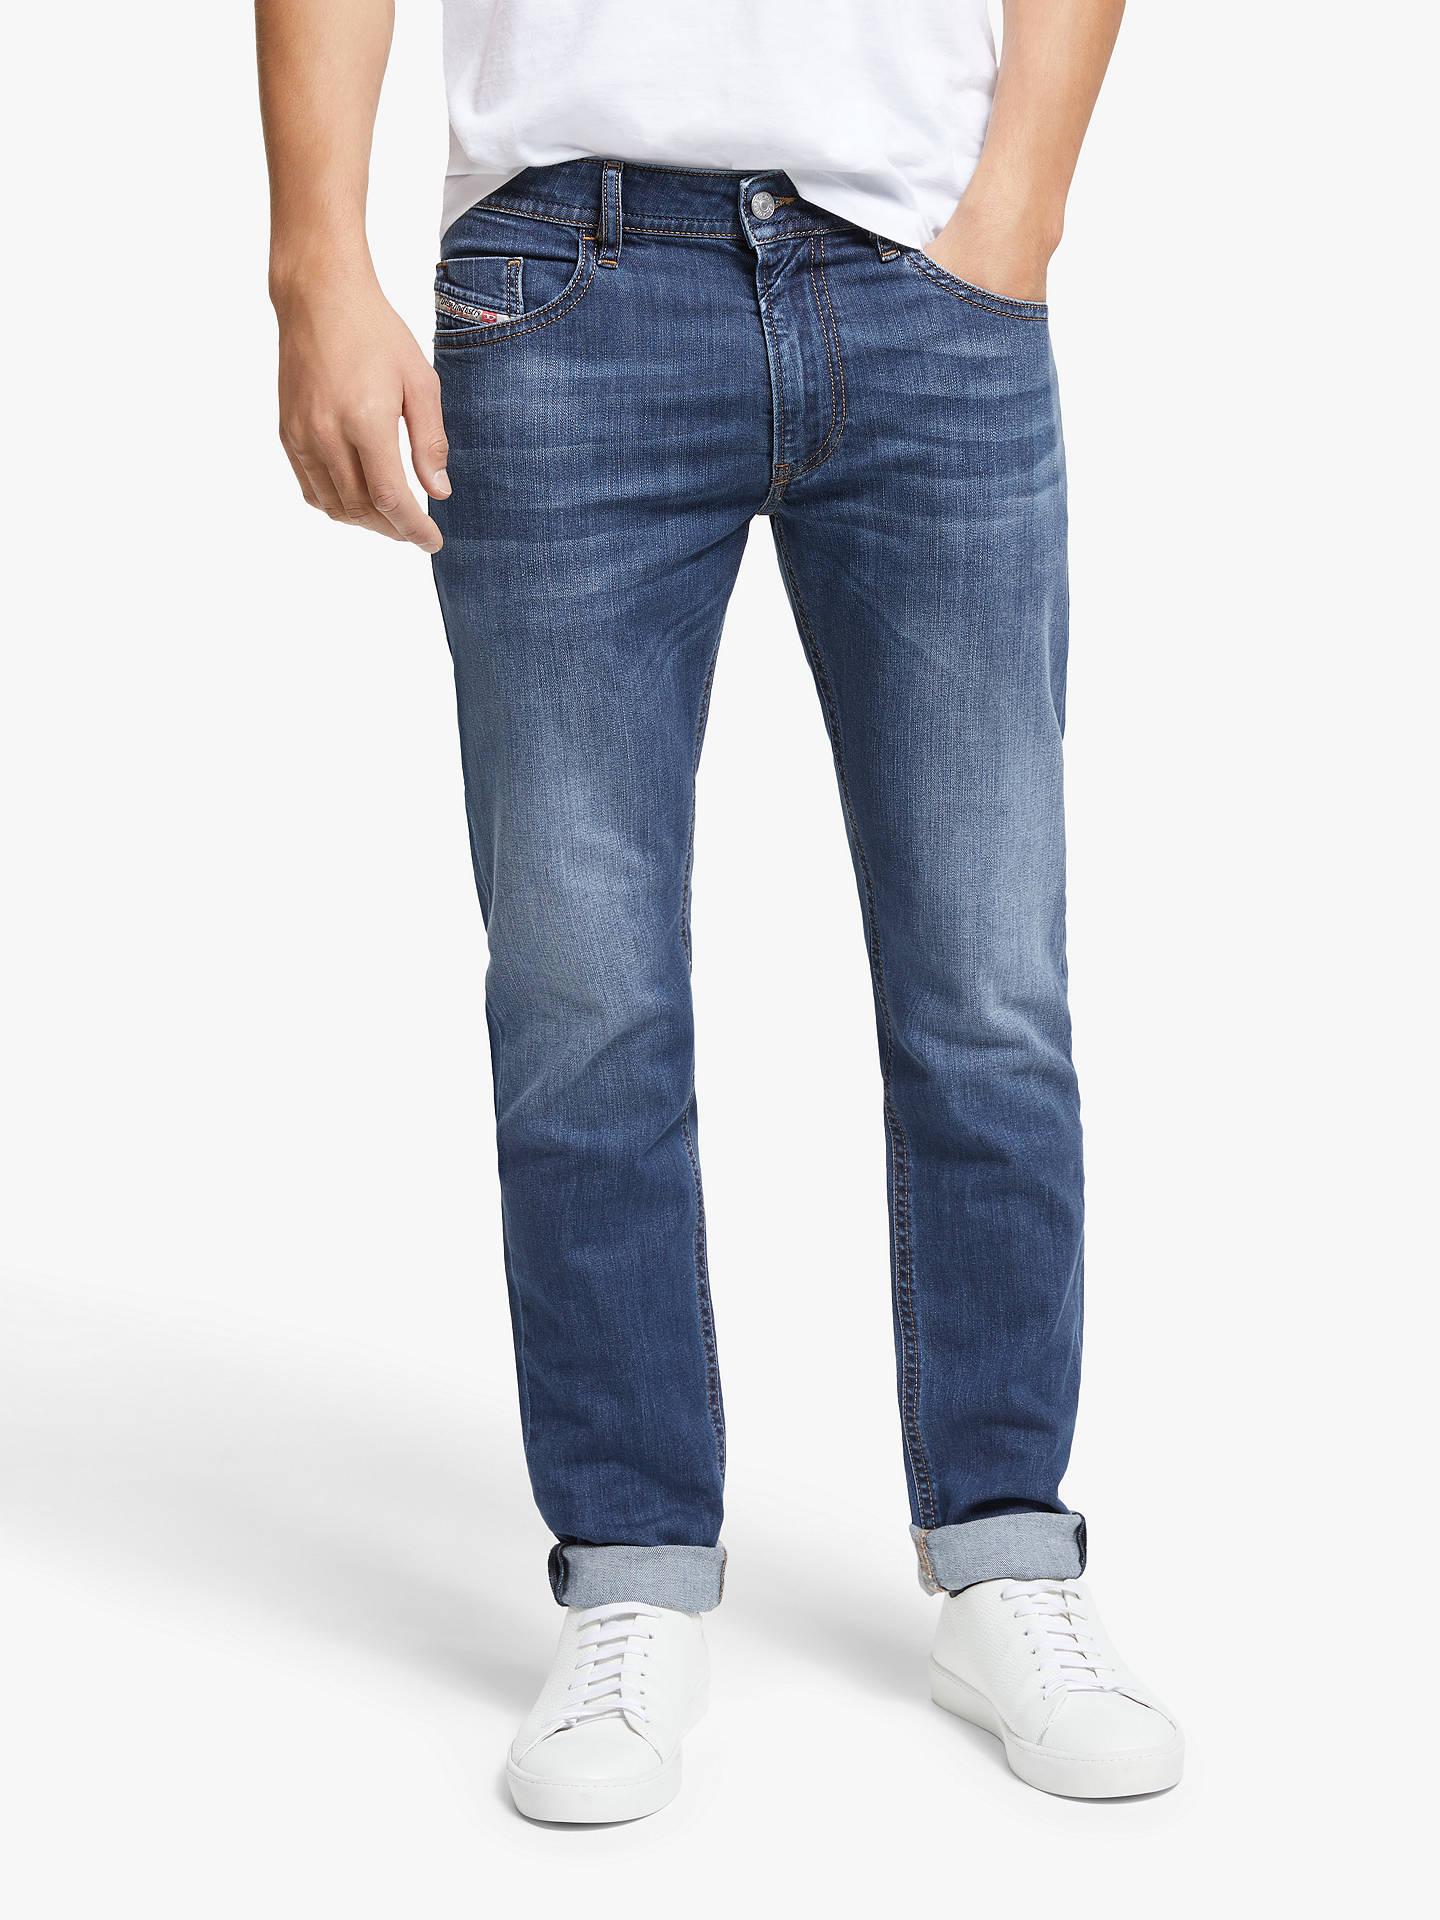 migliori scarpe da ginnastica dd698 7d122 Diesel Thommer Slim Jeans, Medium Blue 082AZ